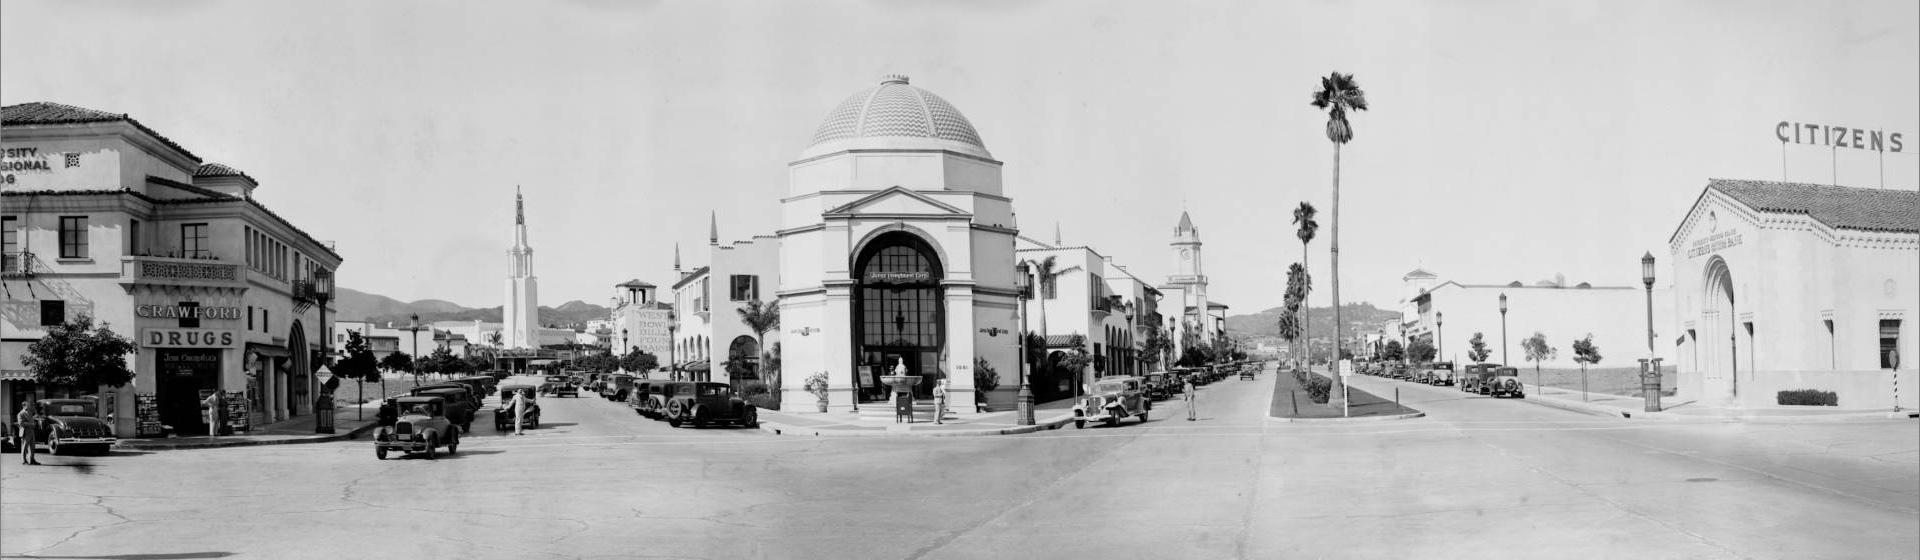 westwood-village-1932